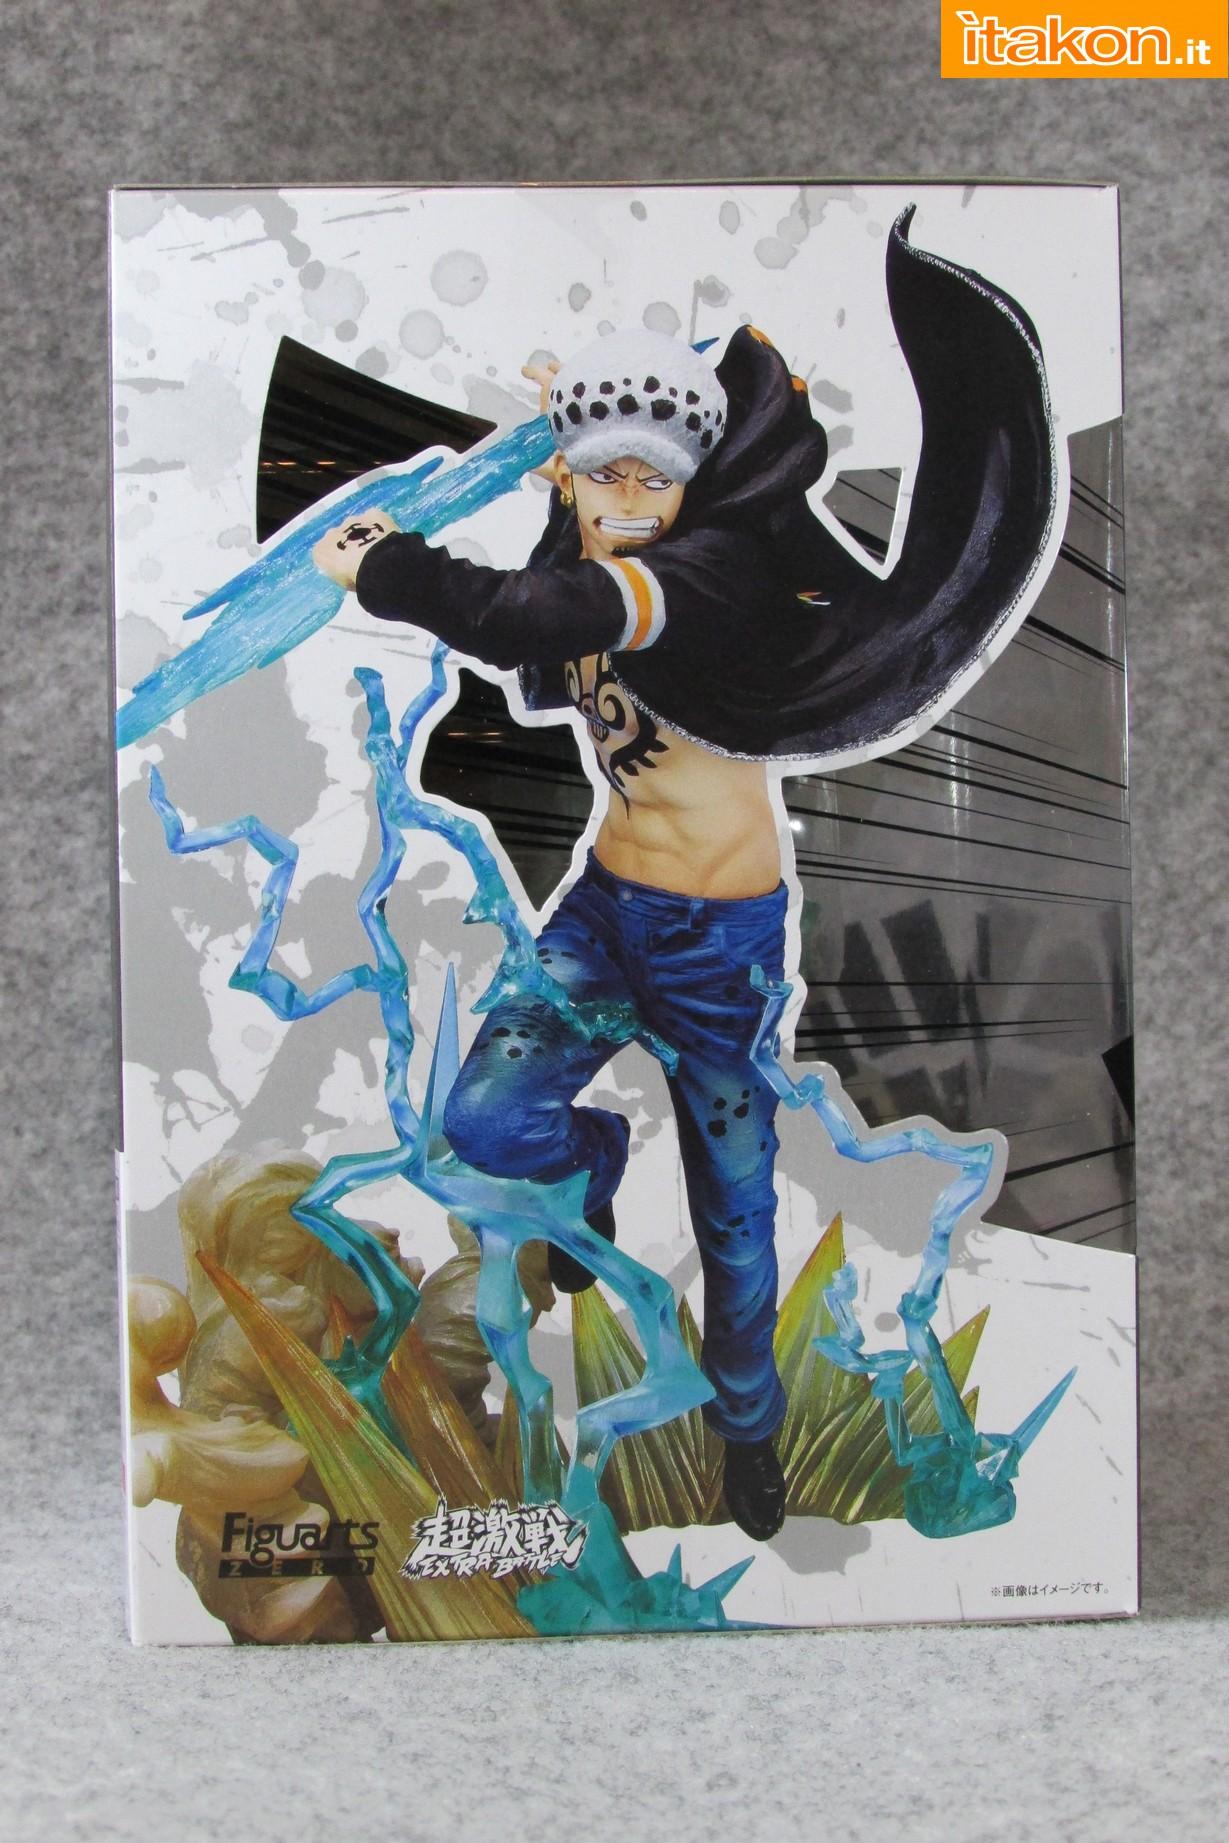 Link a One Piece Trafalgar Law Gamma Knife Figuarts ZERO Chou Gekisen Extra Battle Recensione Review Itakon.it 05